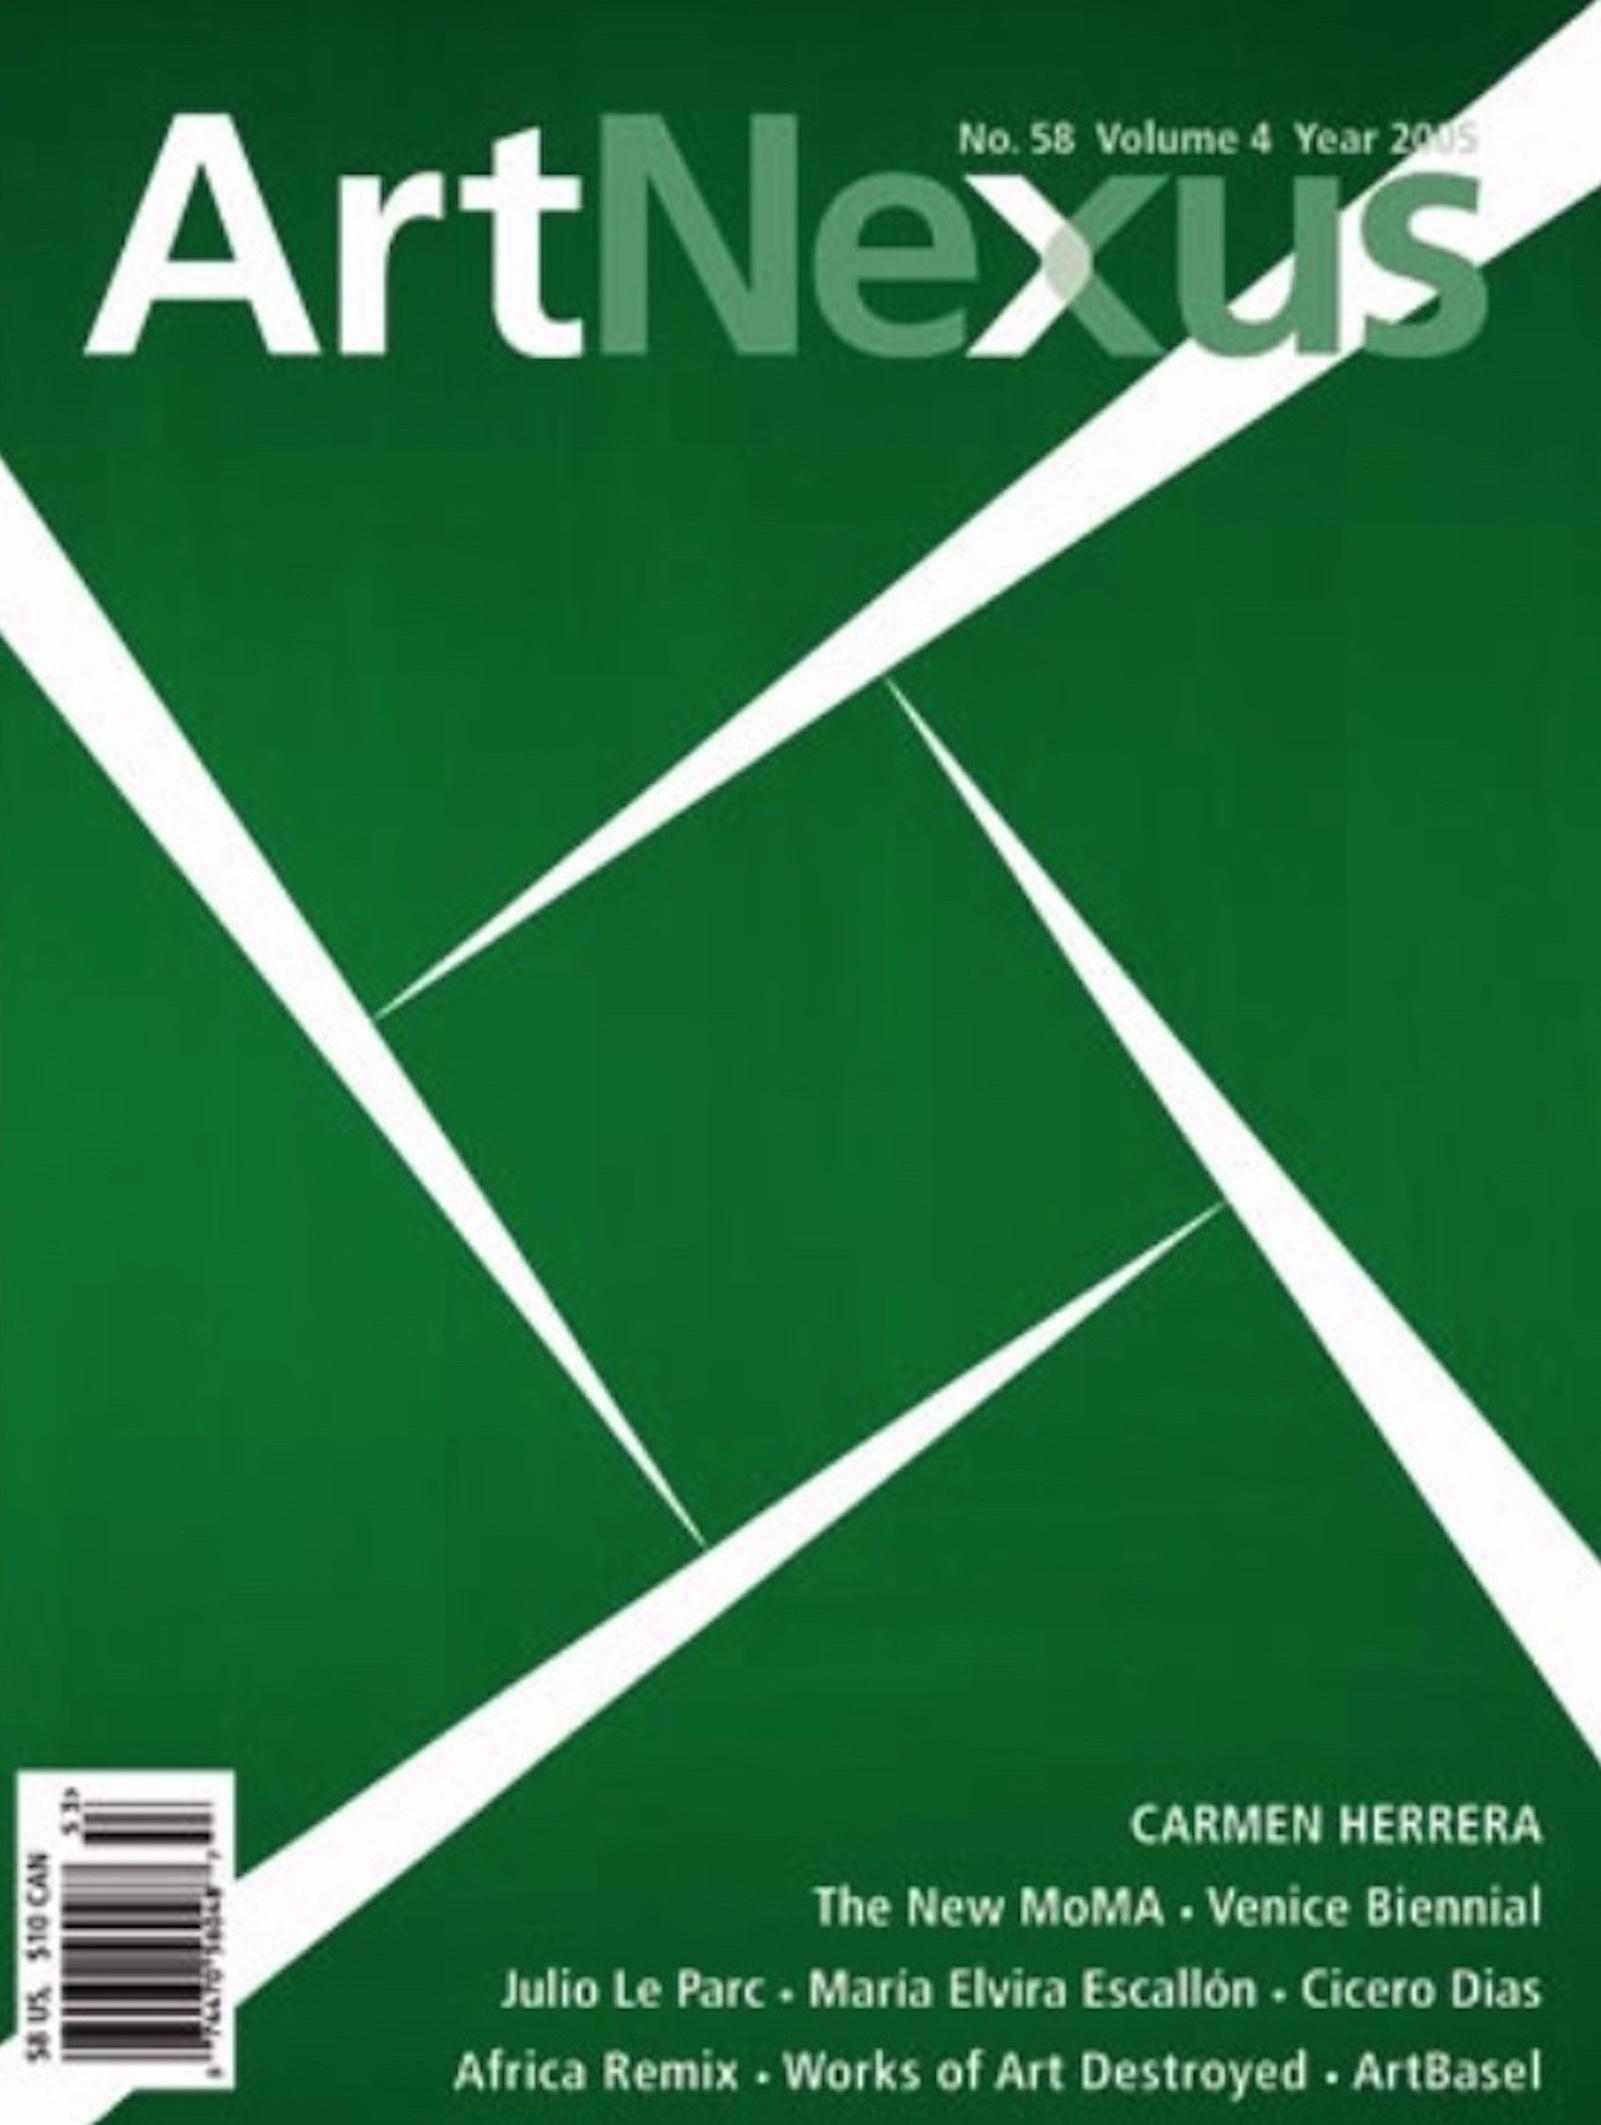 ArtNexus_2005_vol.4_58_Javier Tellez_Jose Bedia